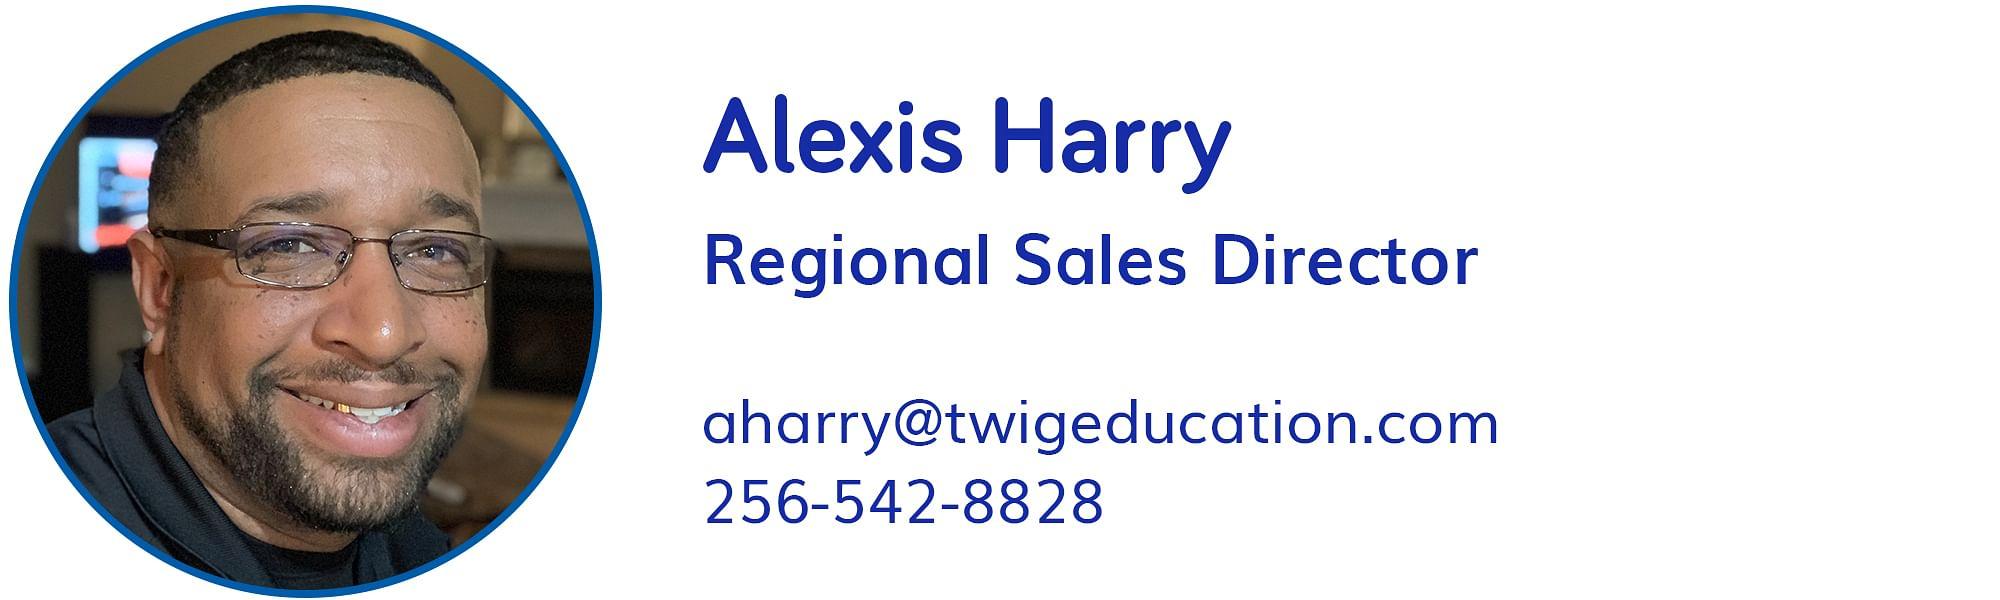 Alexis Harry, aharry@twigeducation.com, 256-542-8828